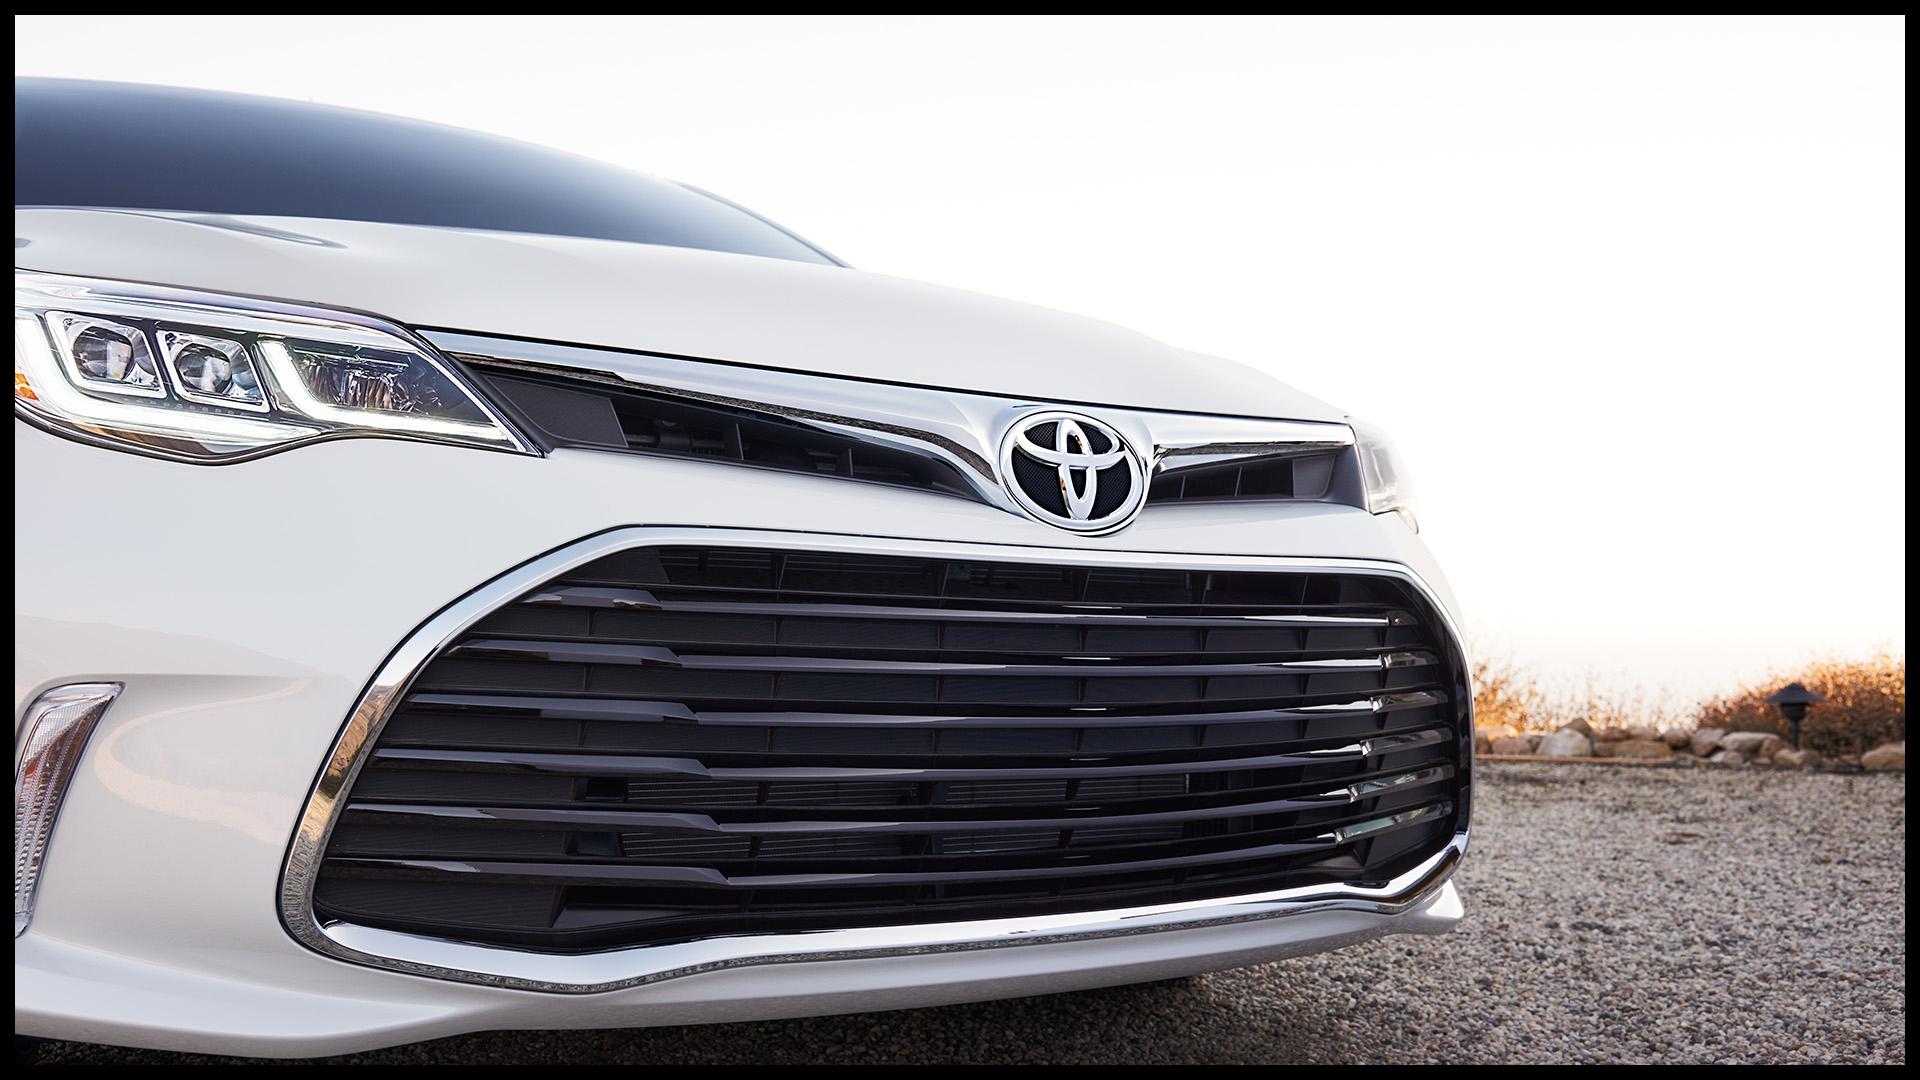 Auto Detailing Deals in Missoula MT